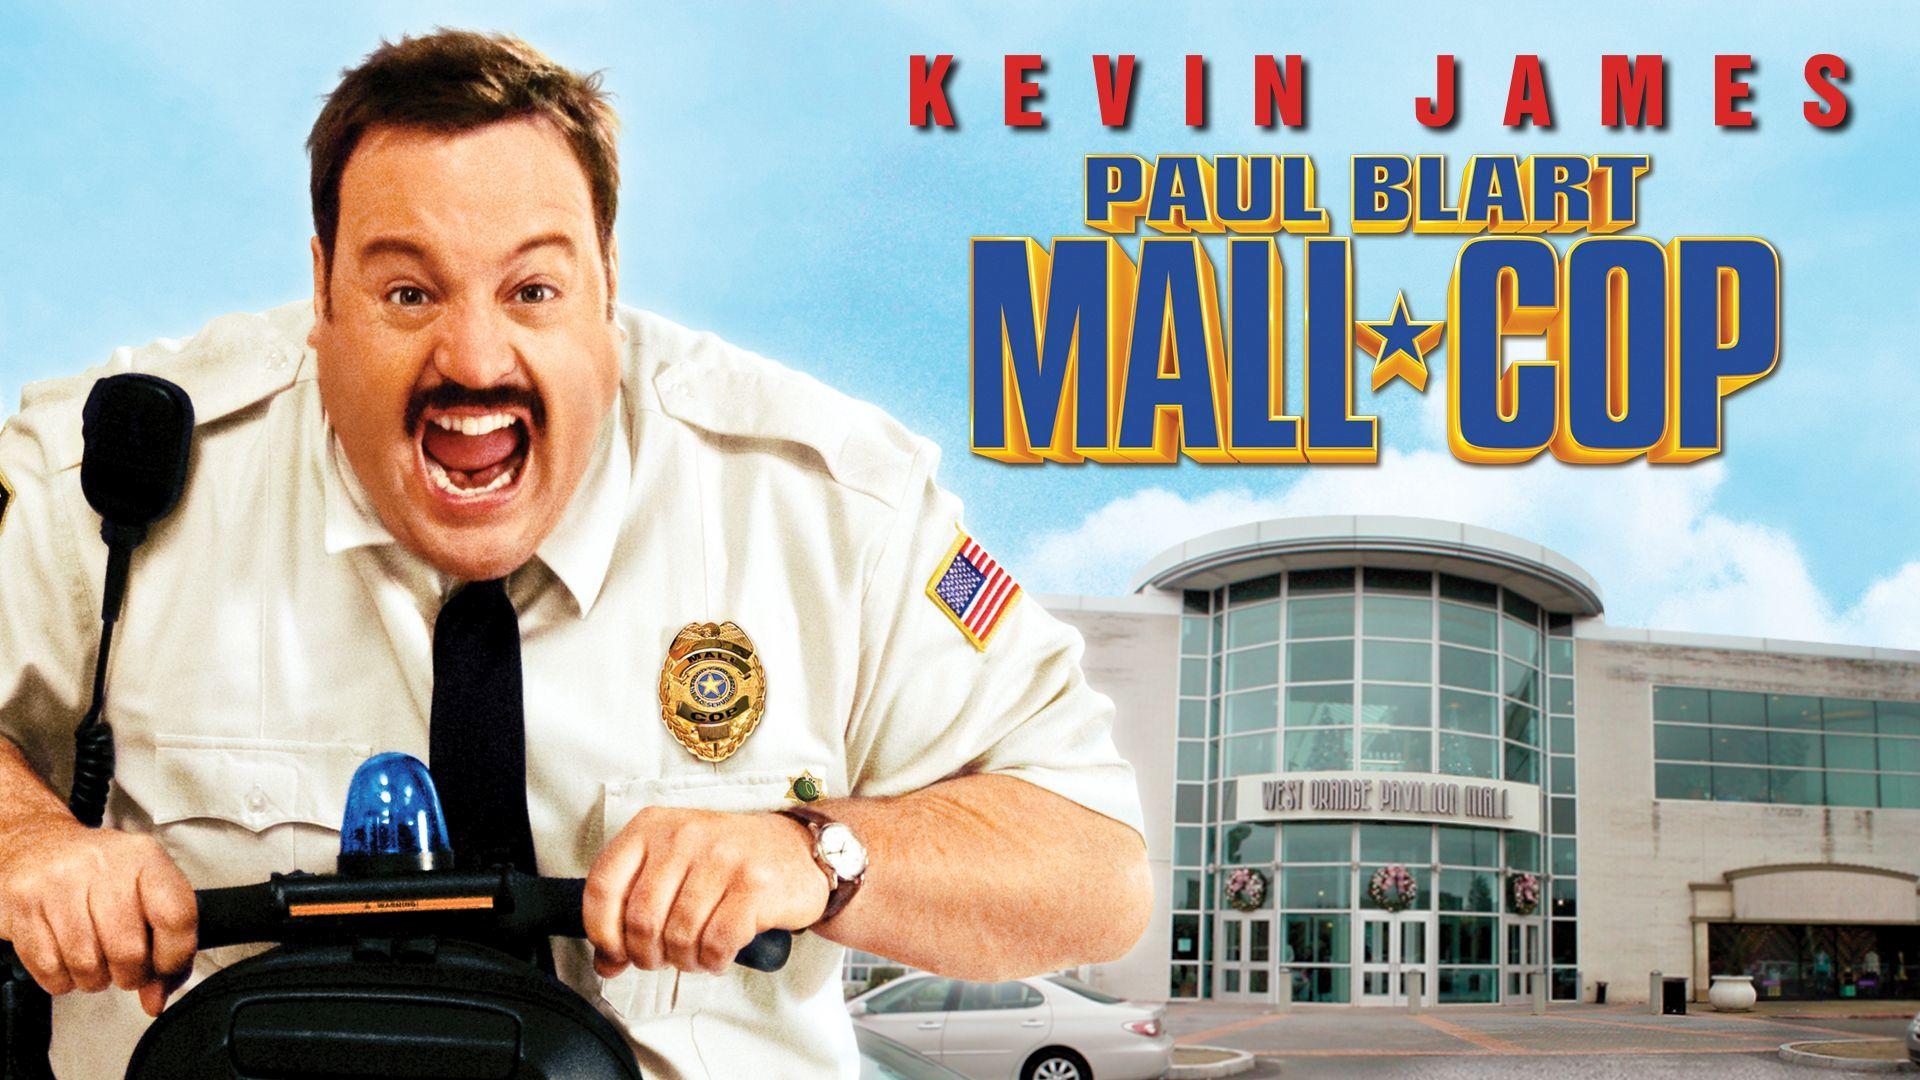 Watch Paul Blart Mall Cop 2 Prime Video